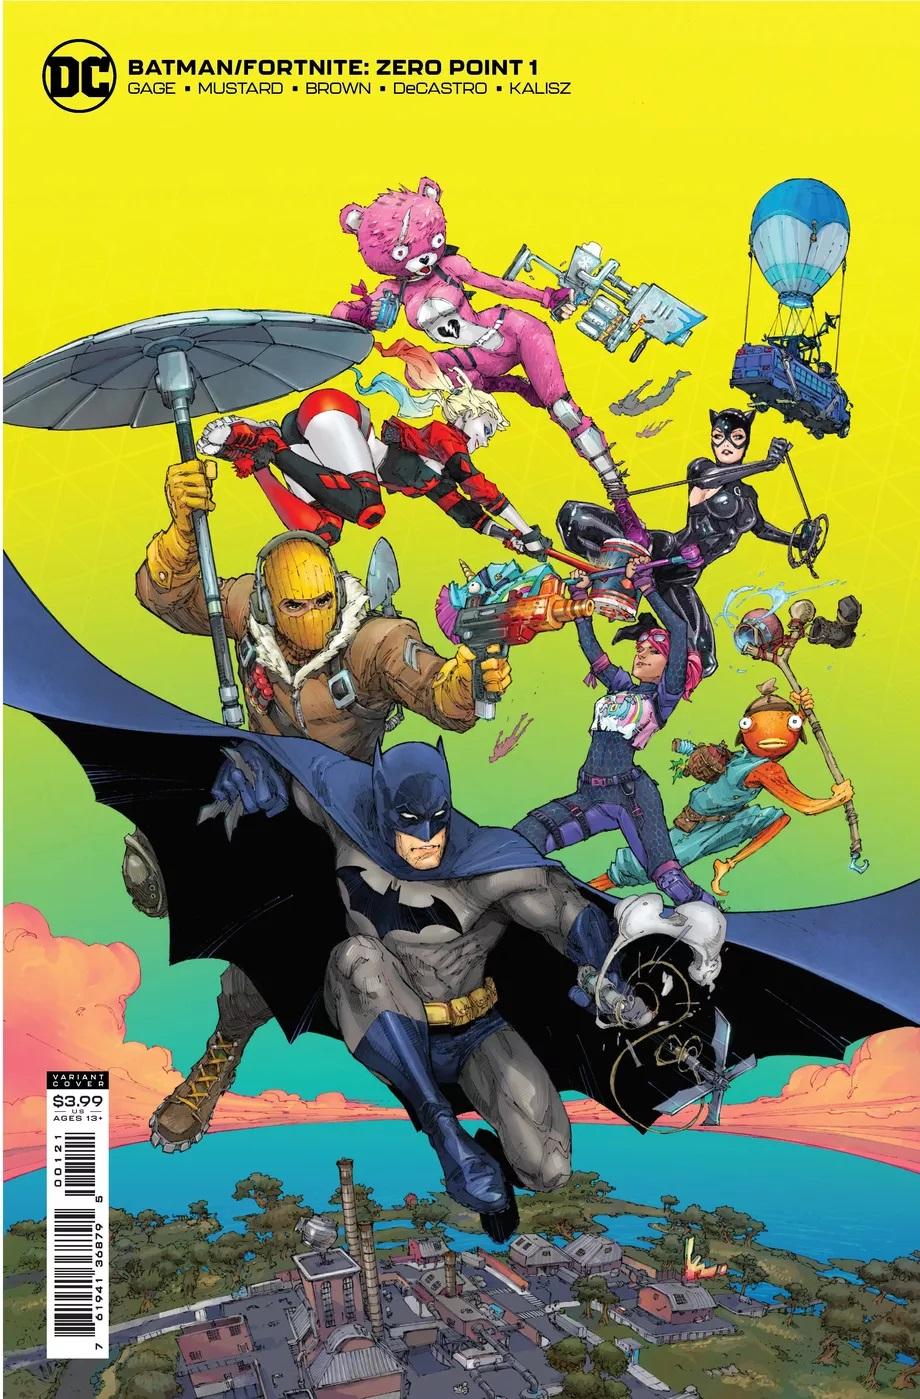 DCвыпустит комикс оприключениях Бэтмена вFortnite. Читатели получат скин Харли Квинн